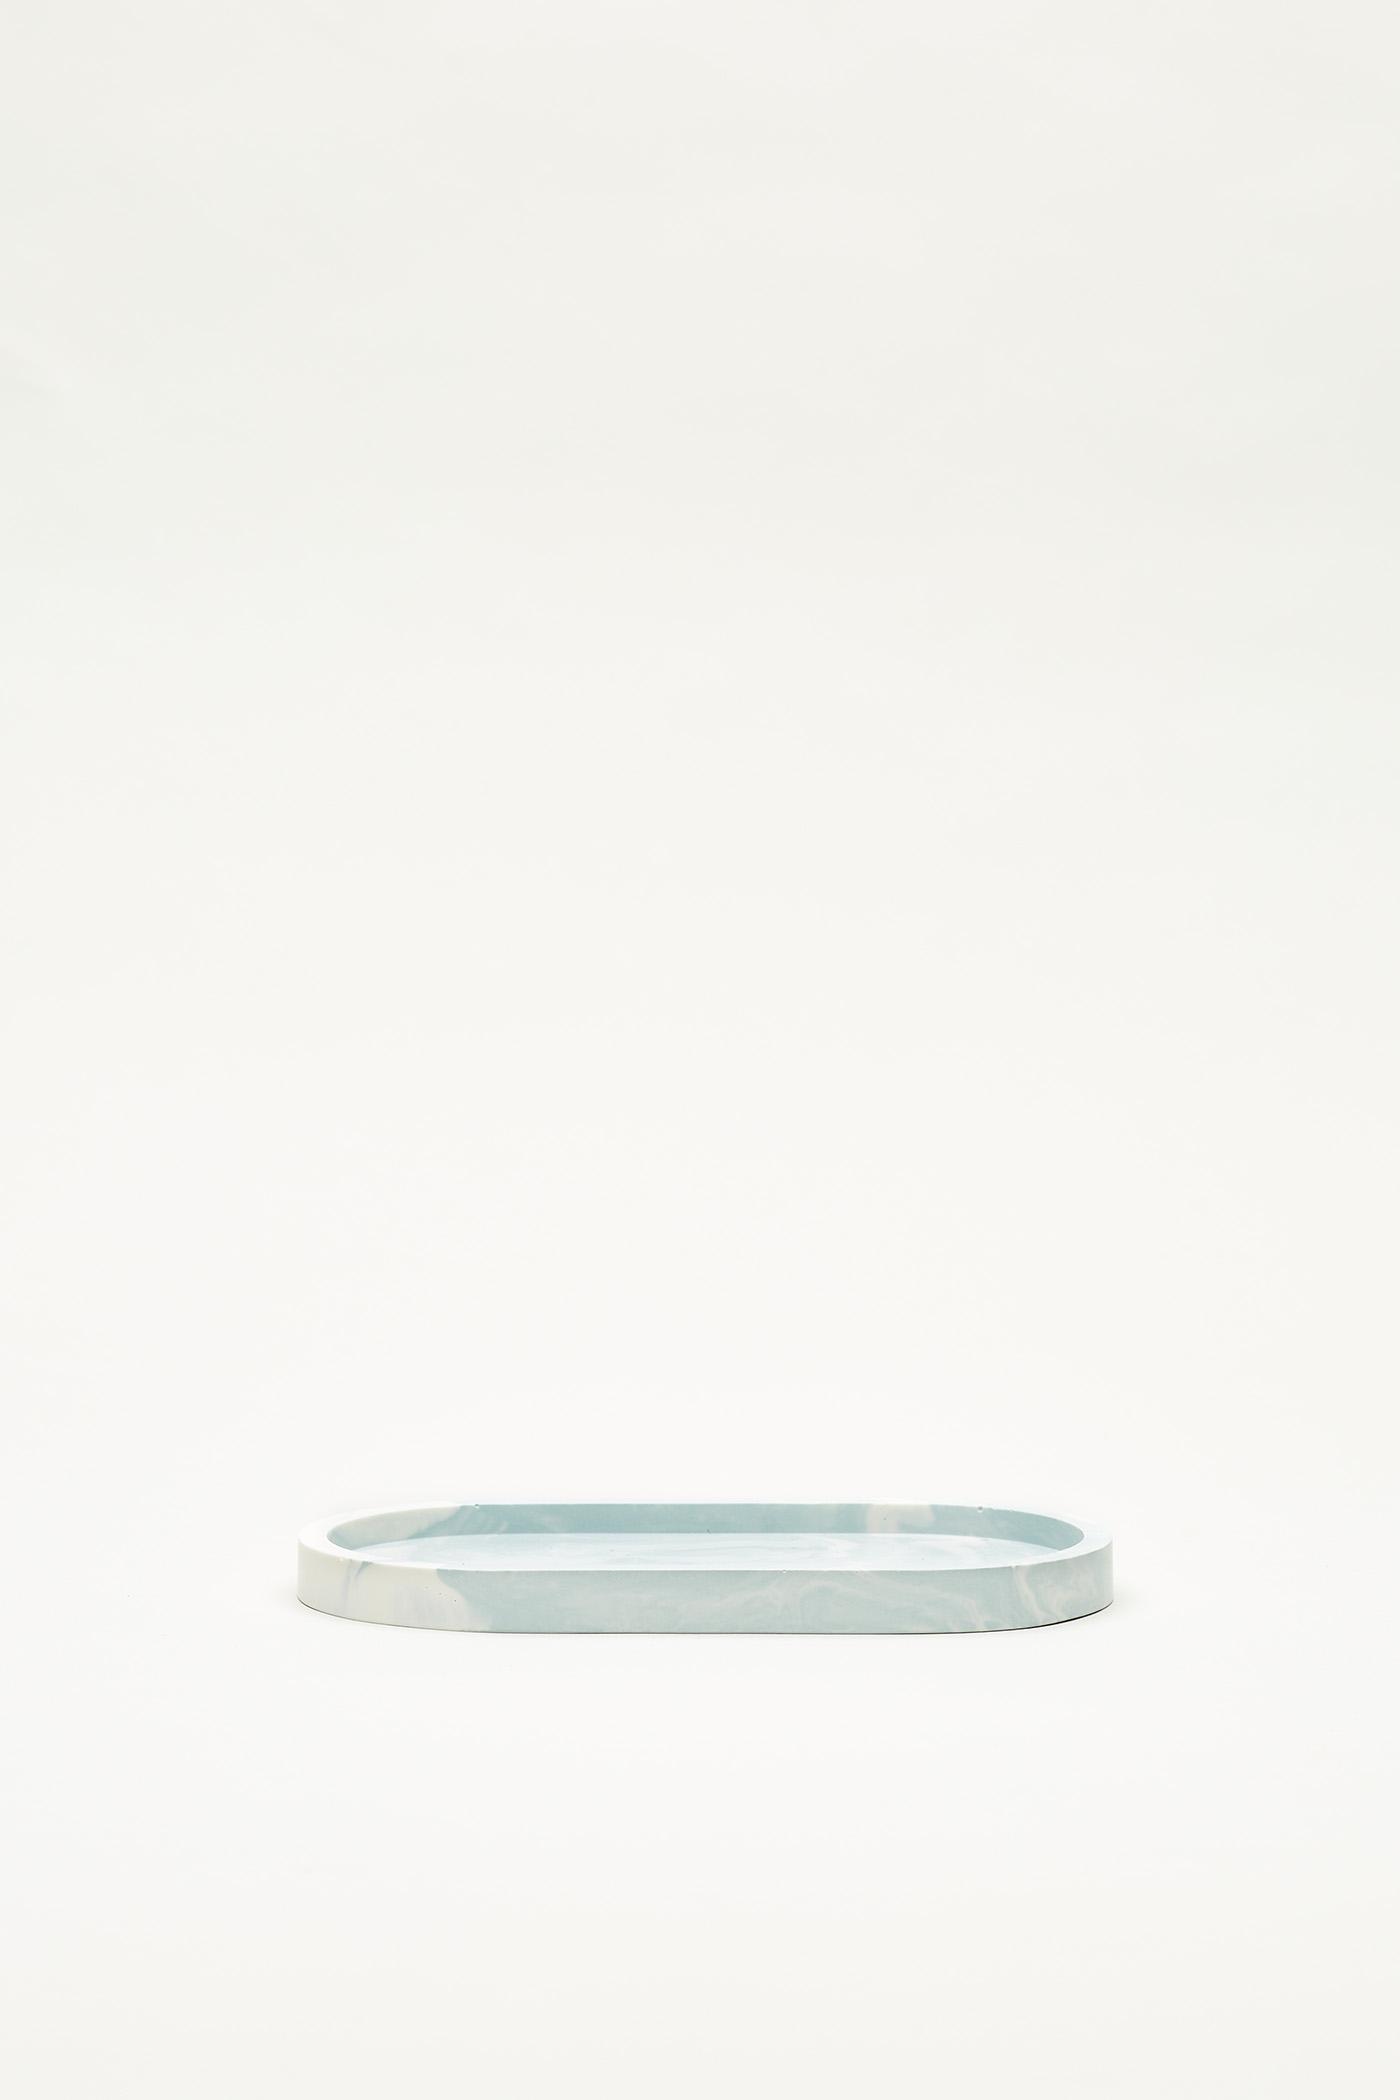 Chokmah Marble-style Pill